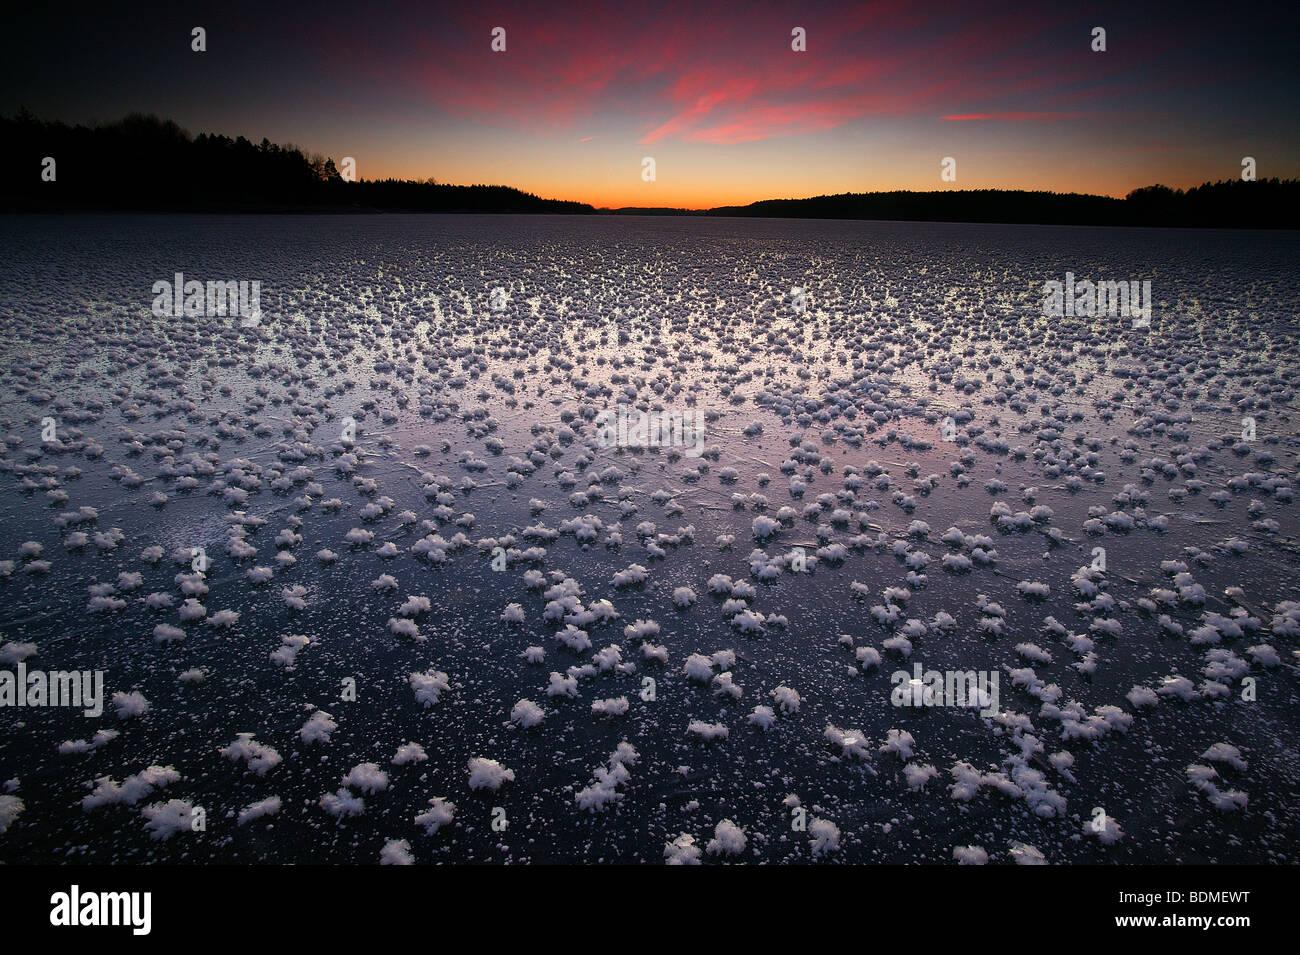 Frost roses a Vanemfjorden nel lago Vansjø, Østfold fylke, Norvegia. Immagini Stock